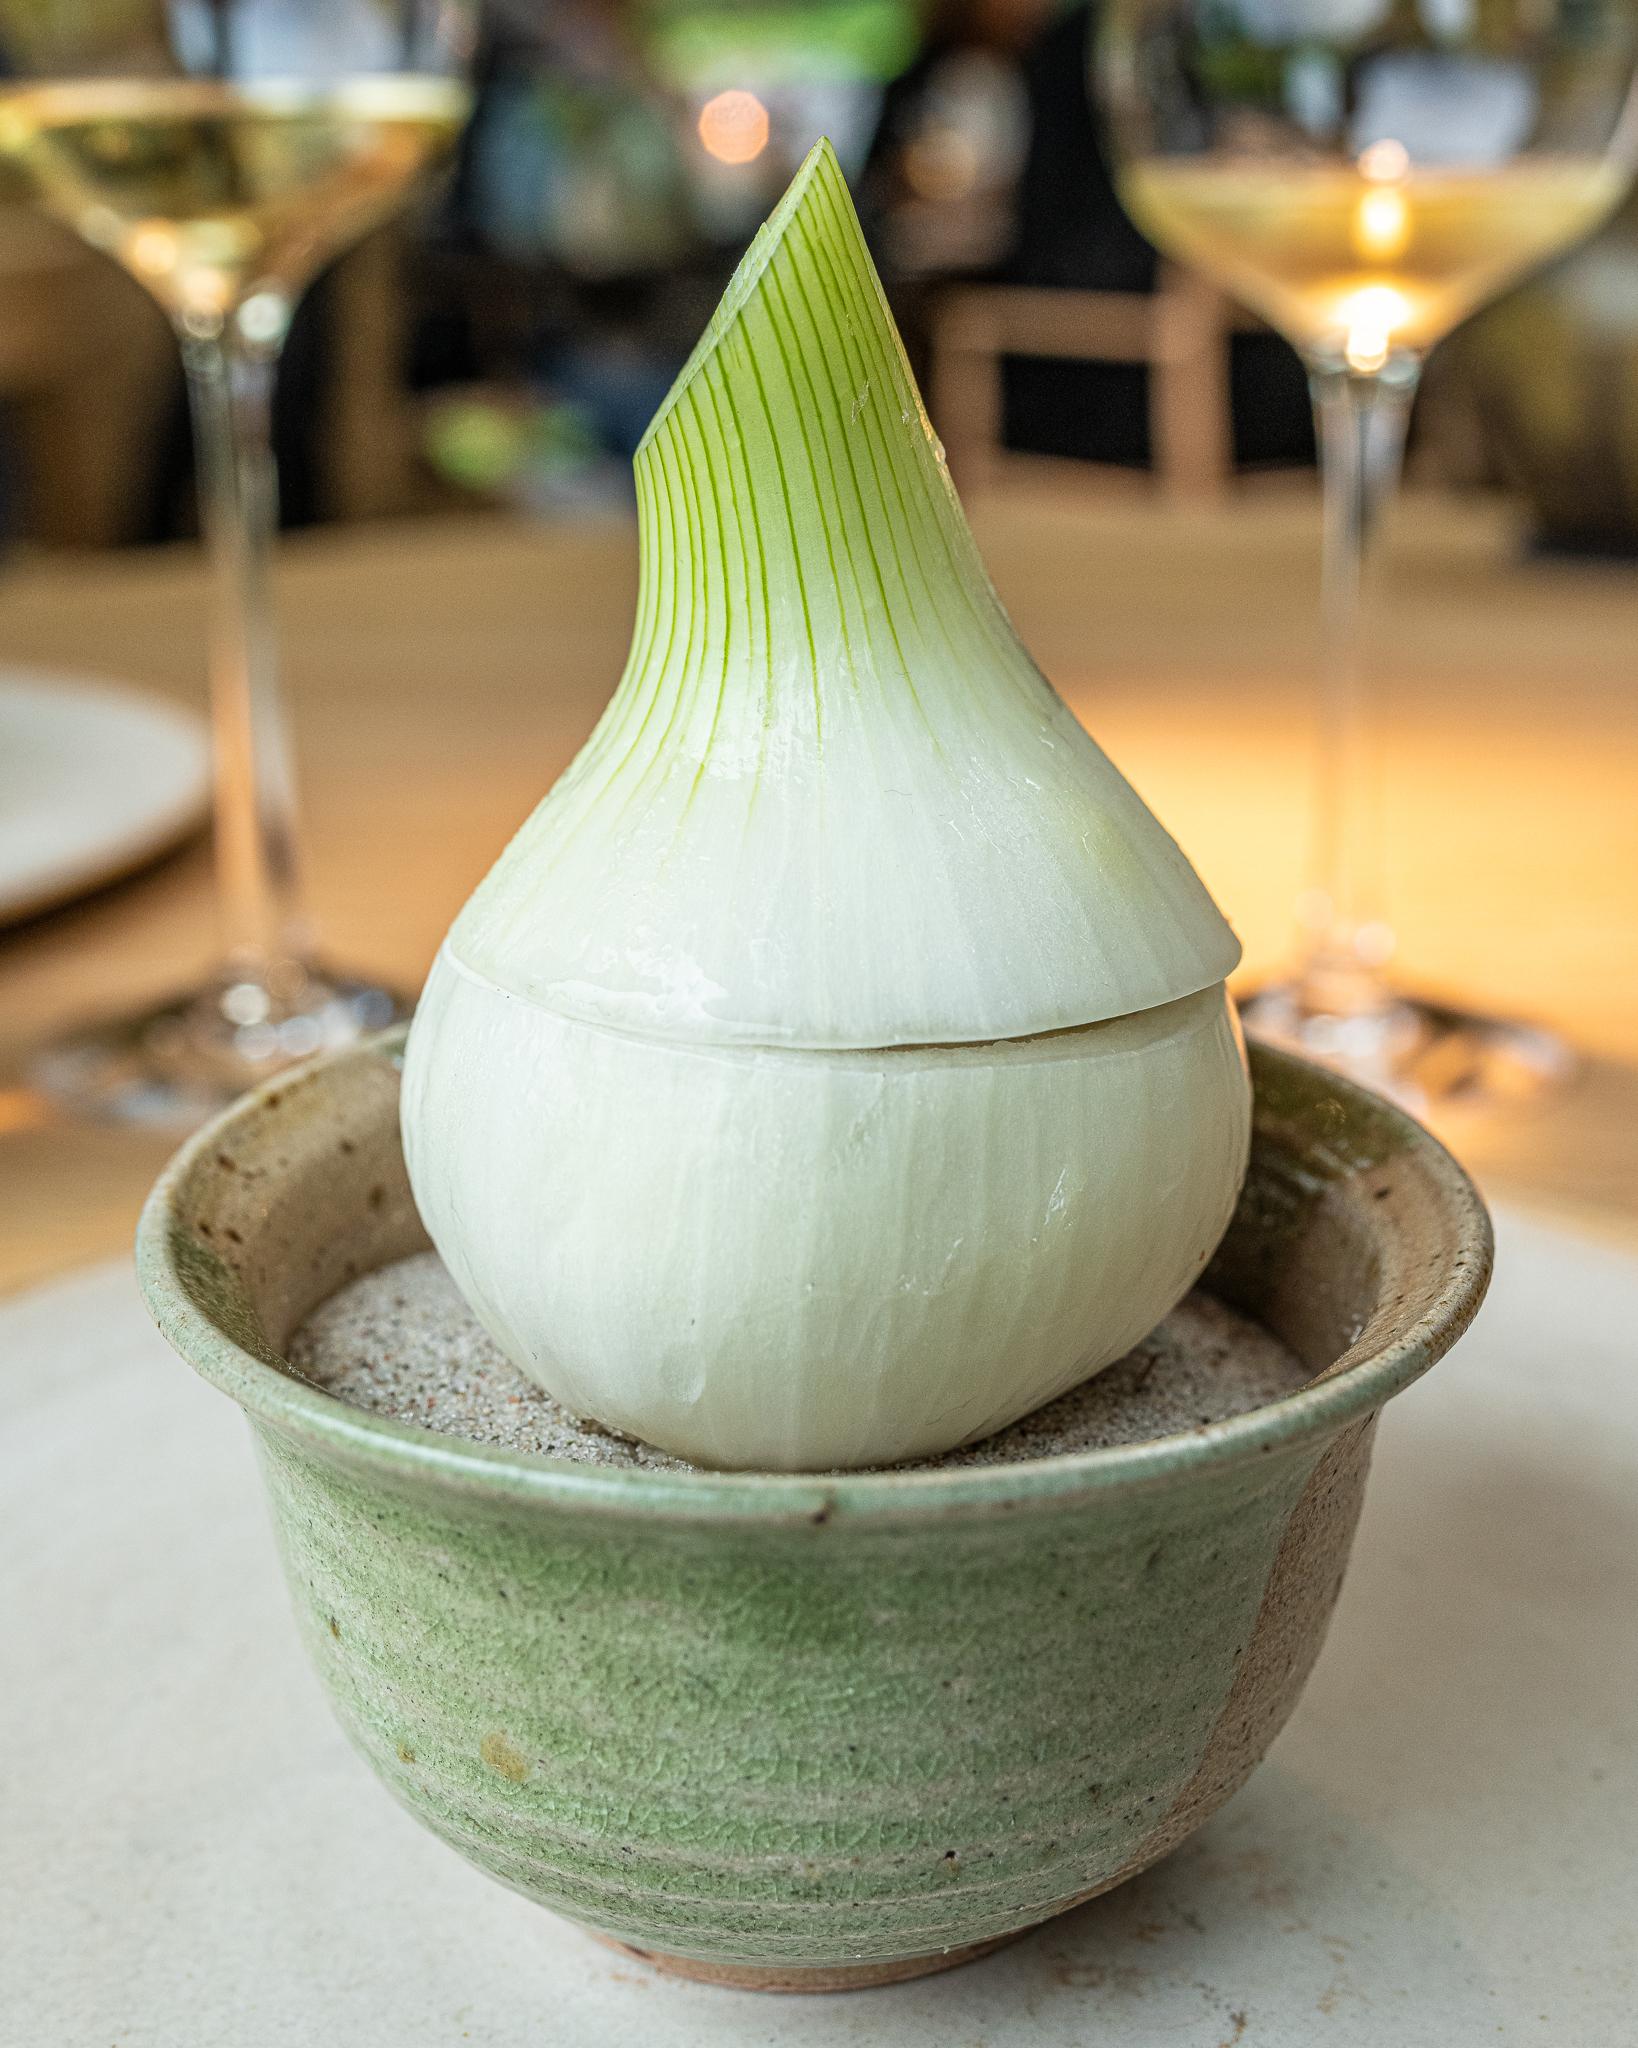 Chilled Onion Bouillon